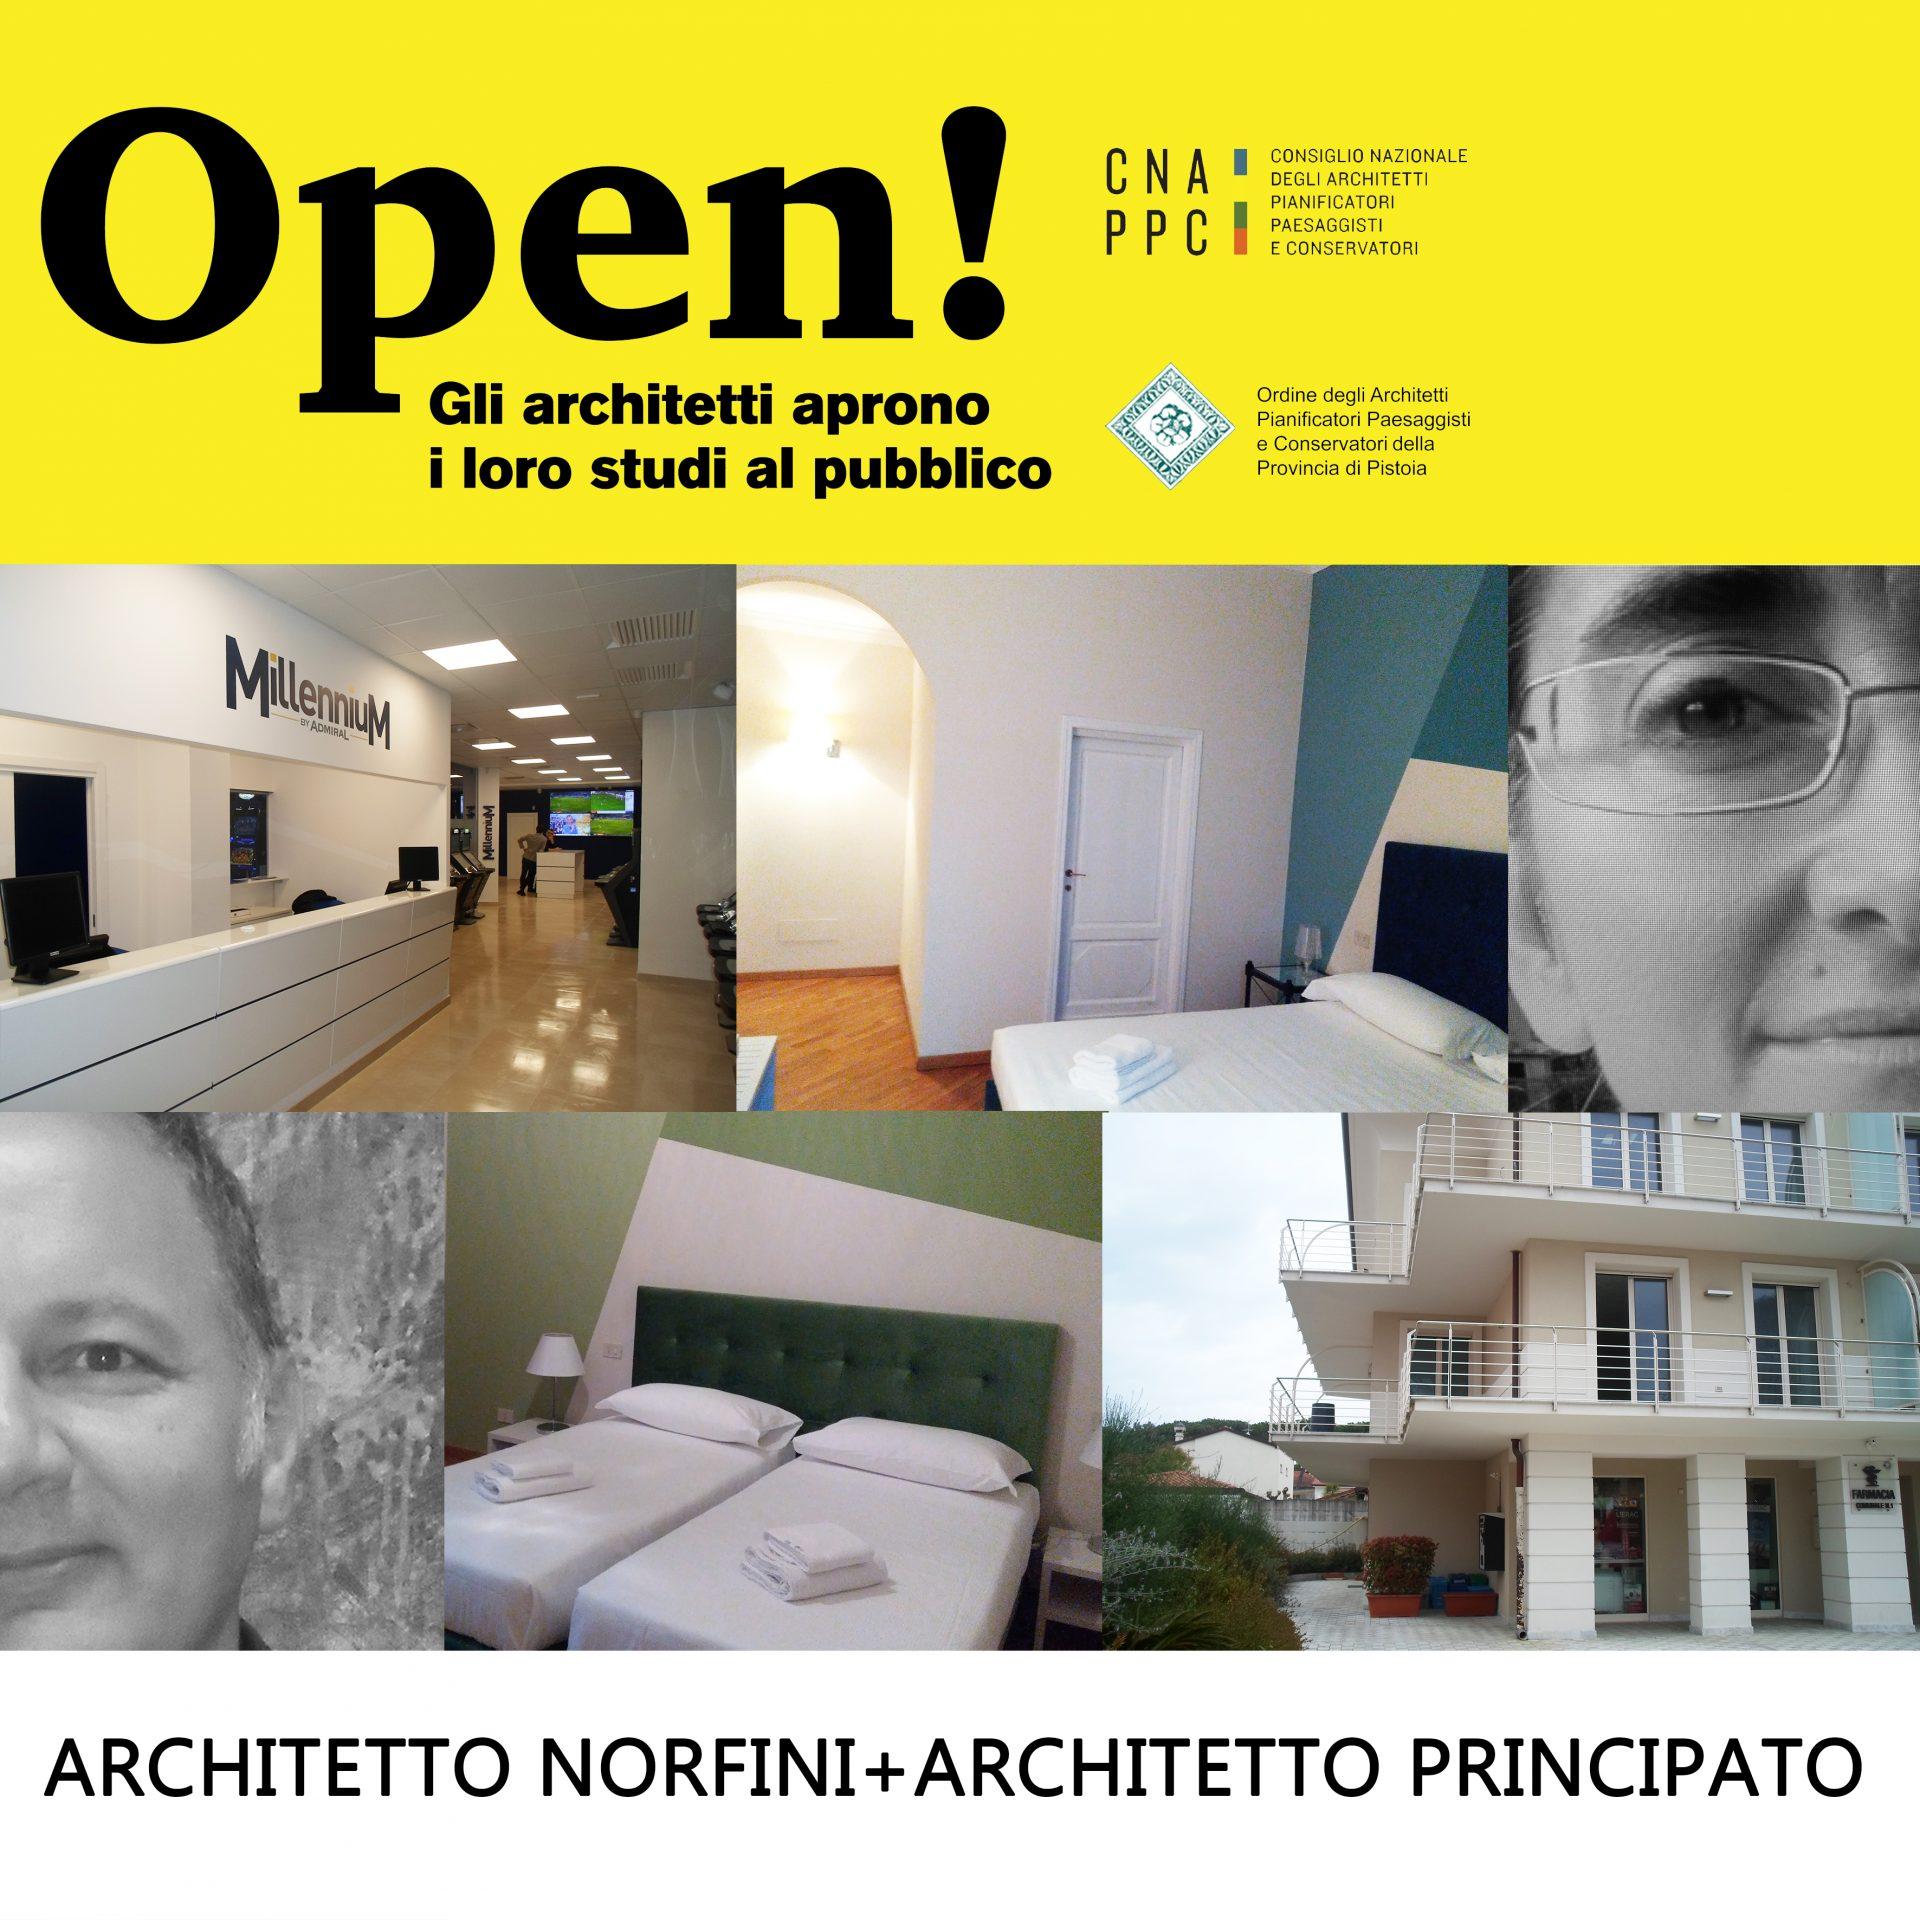 Architettura,interni